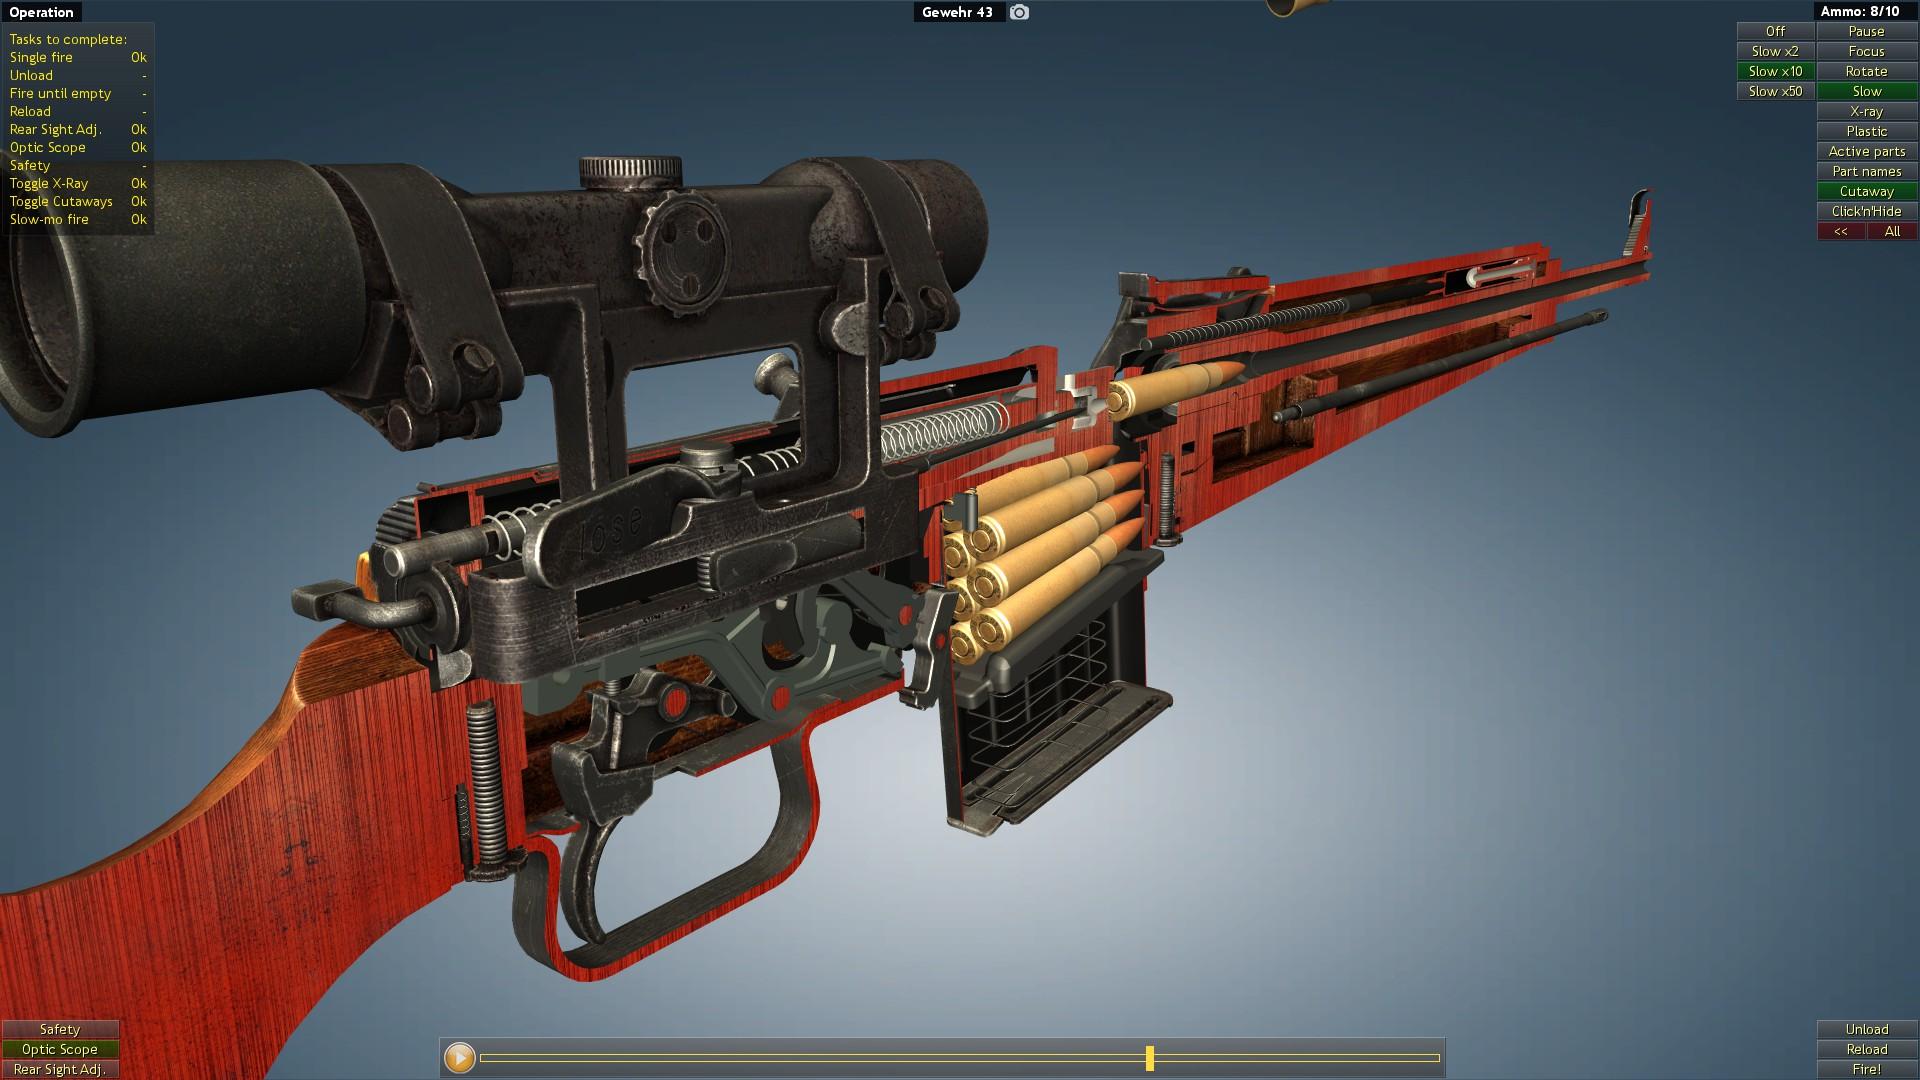 Steam Community :: Screenshot :: Gew43 cutaway